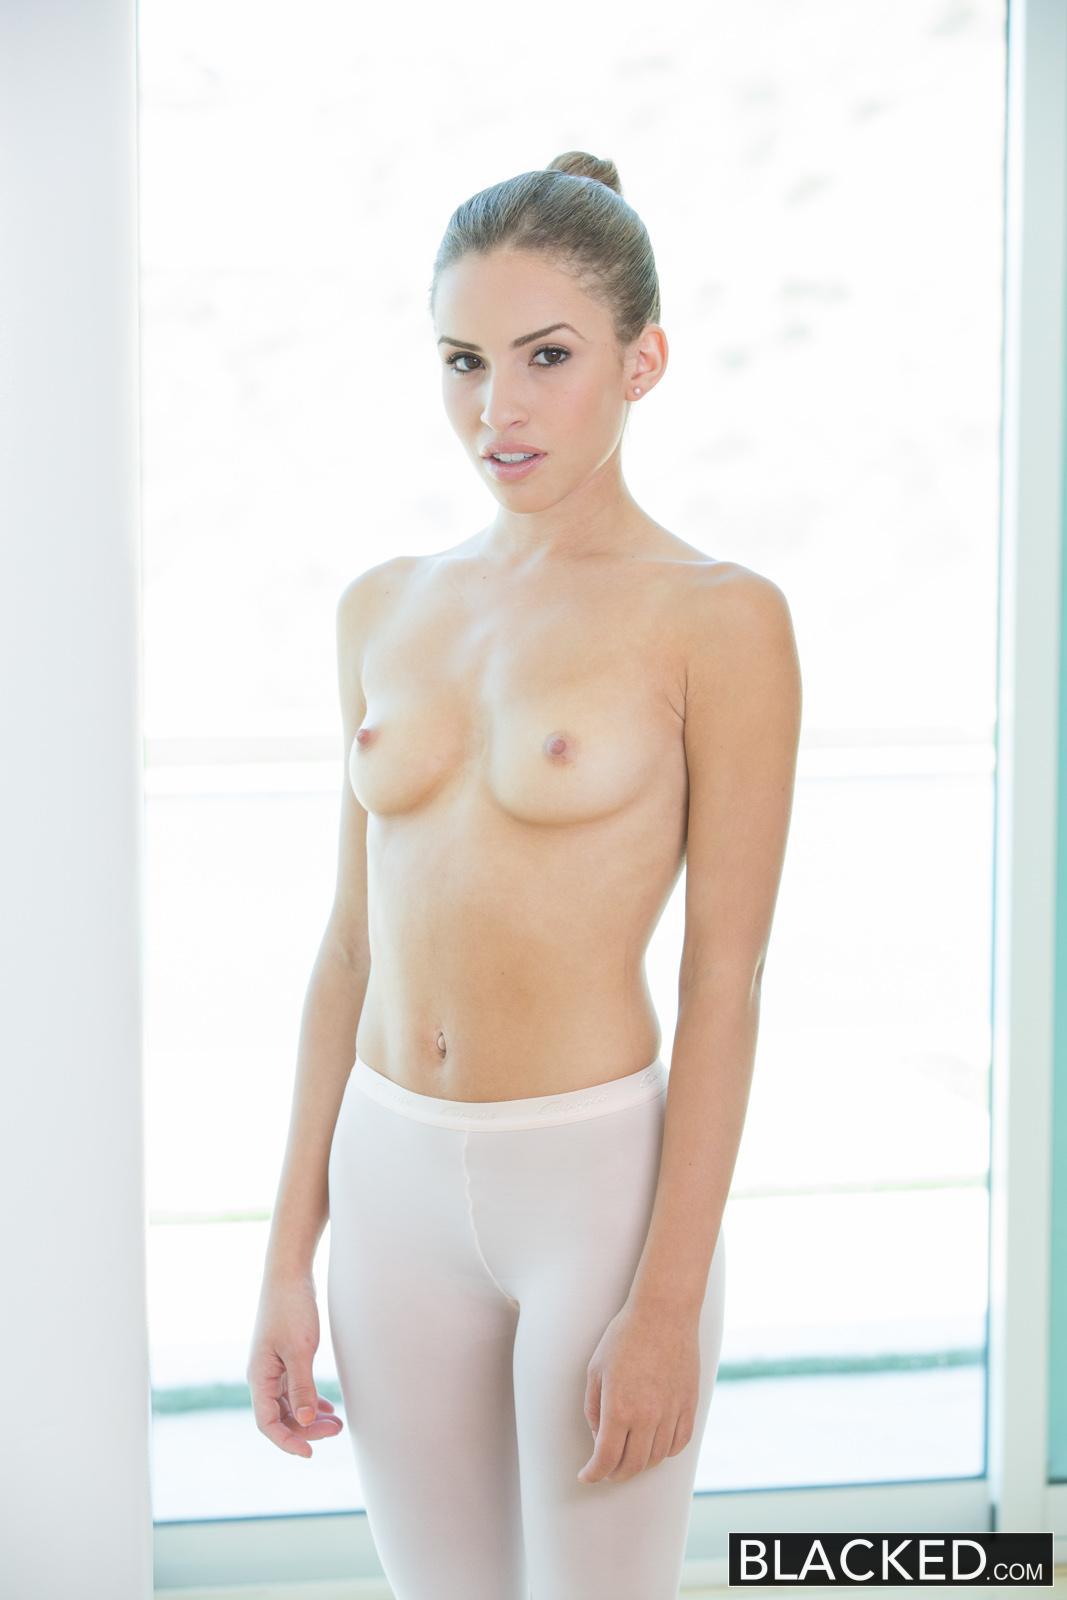 Natasha White Dancer Largie por una gran polla negra-4291